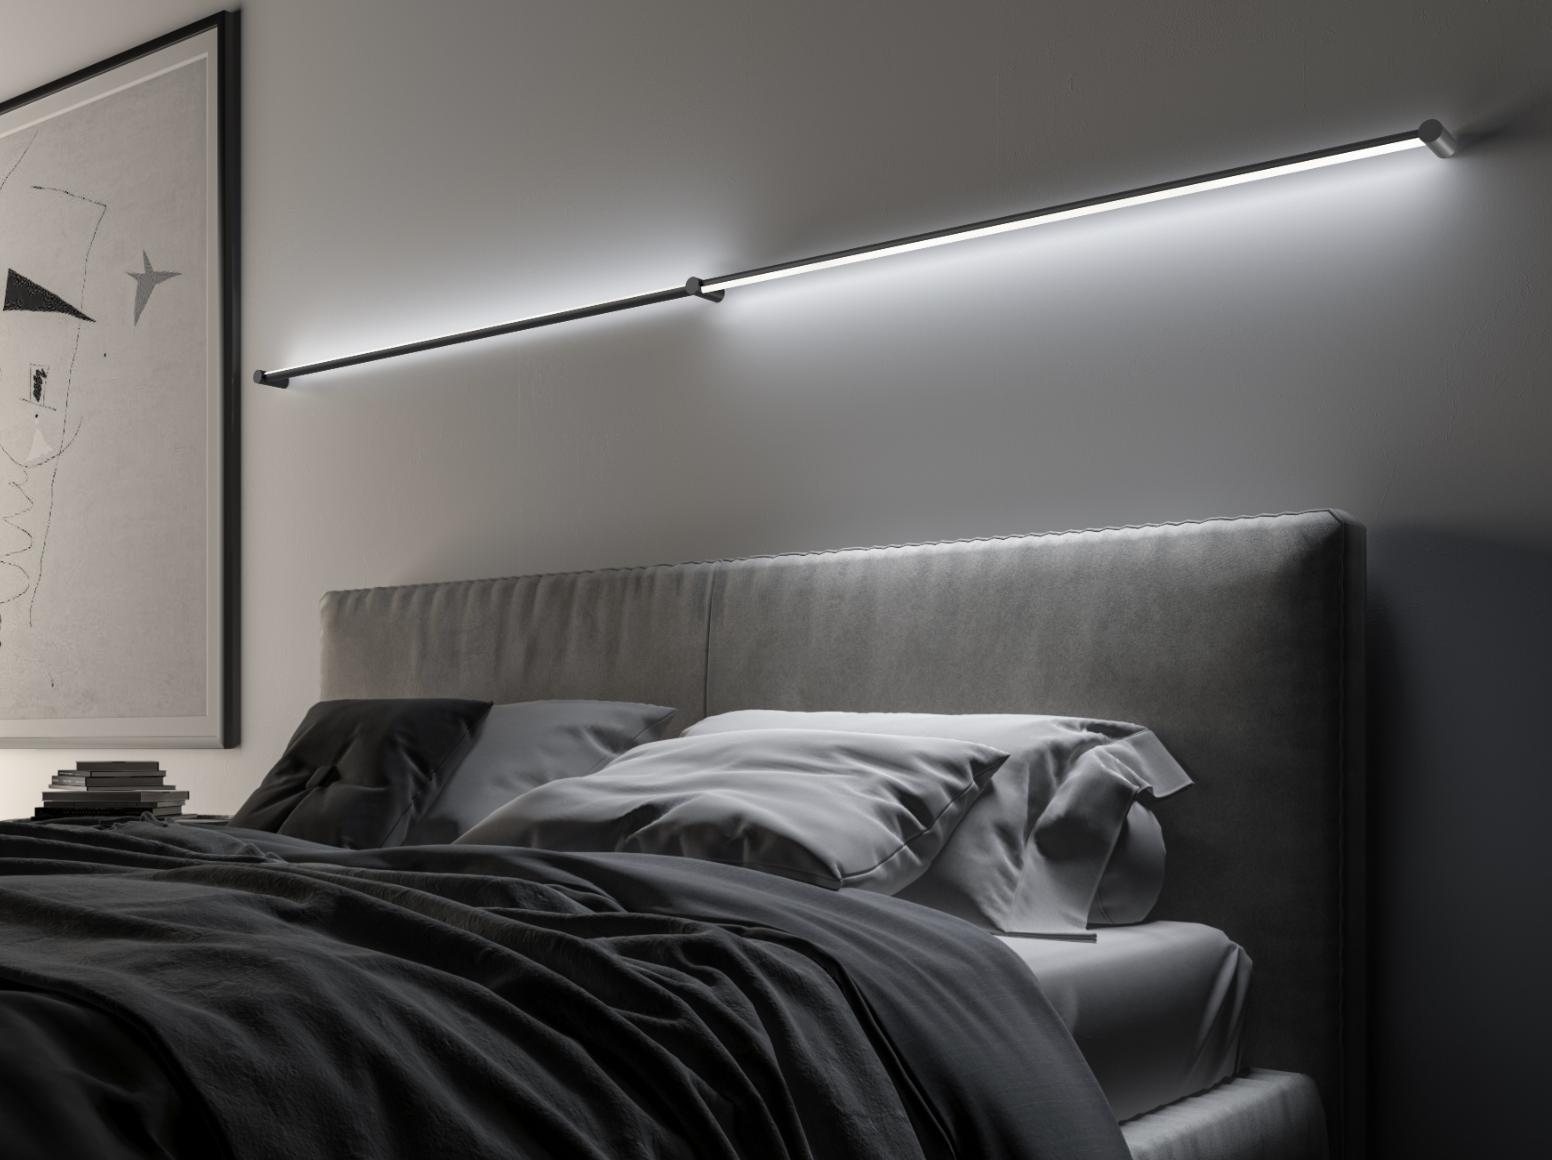 The rotatable Purolinear 360 luminaires provide direct or indirect illumination.